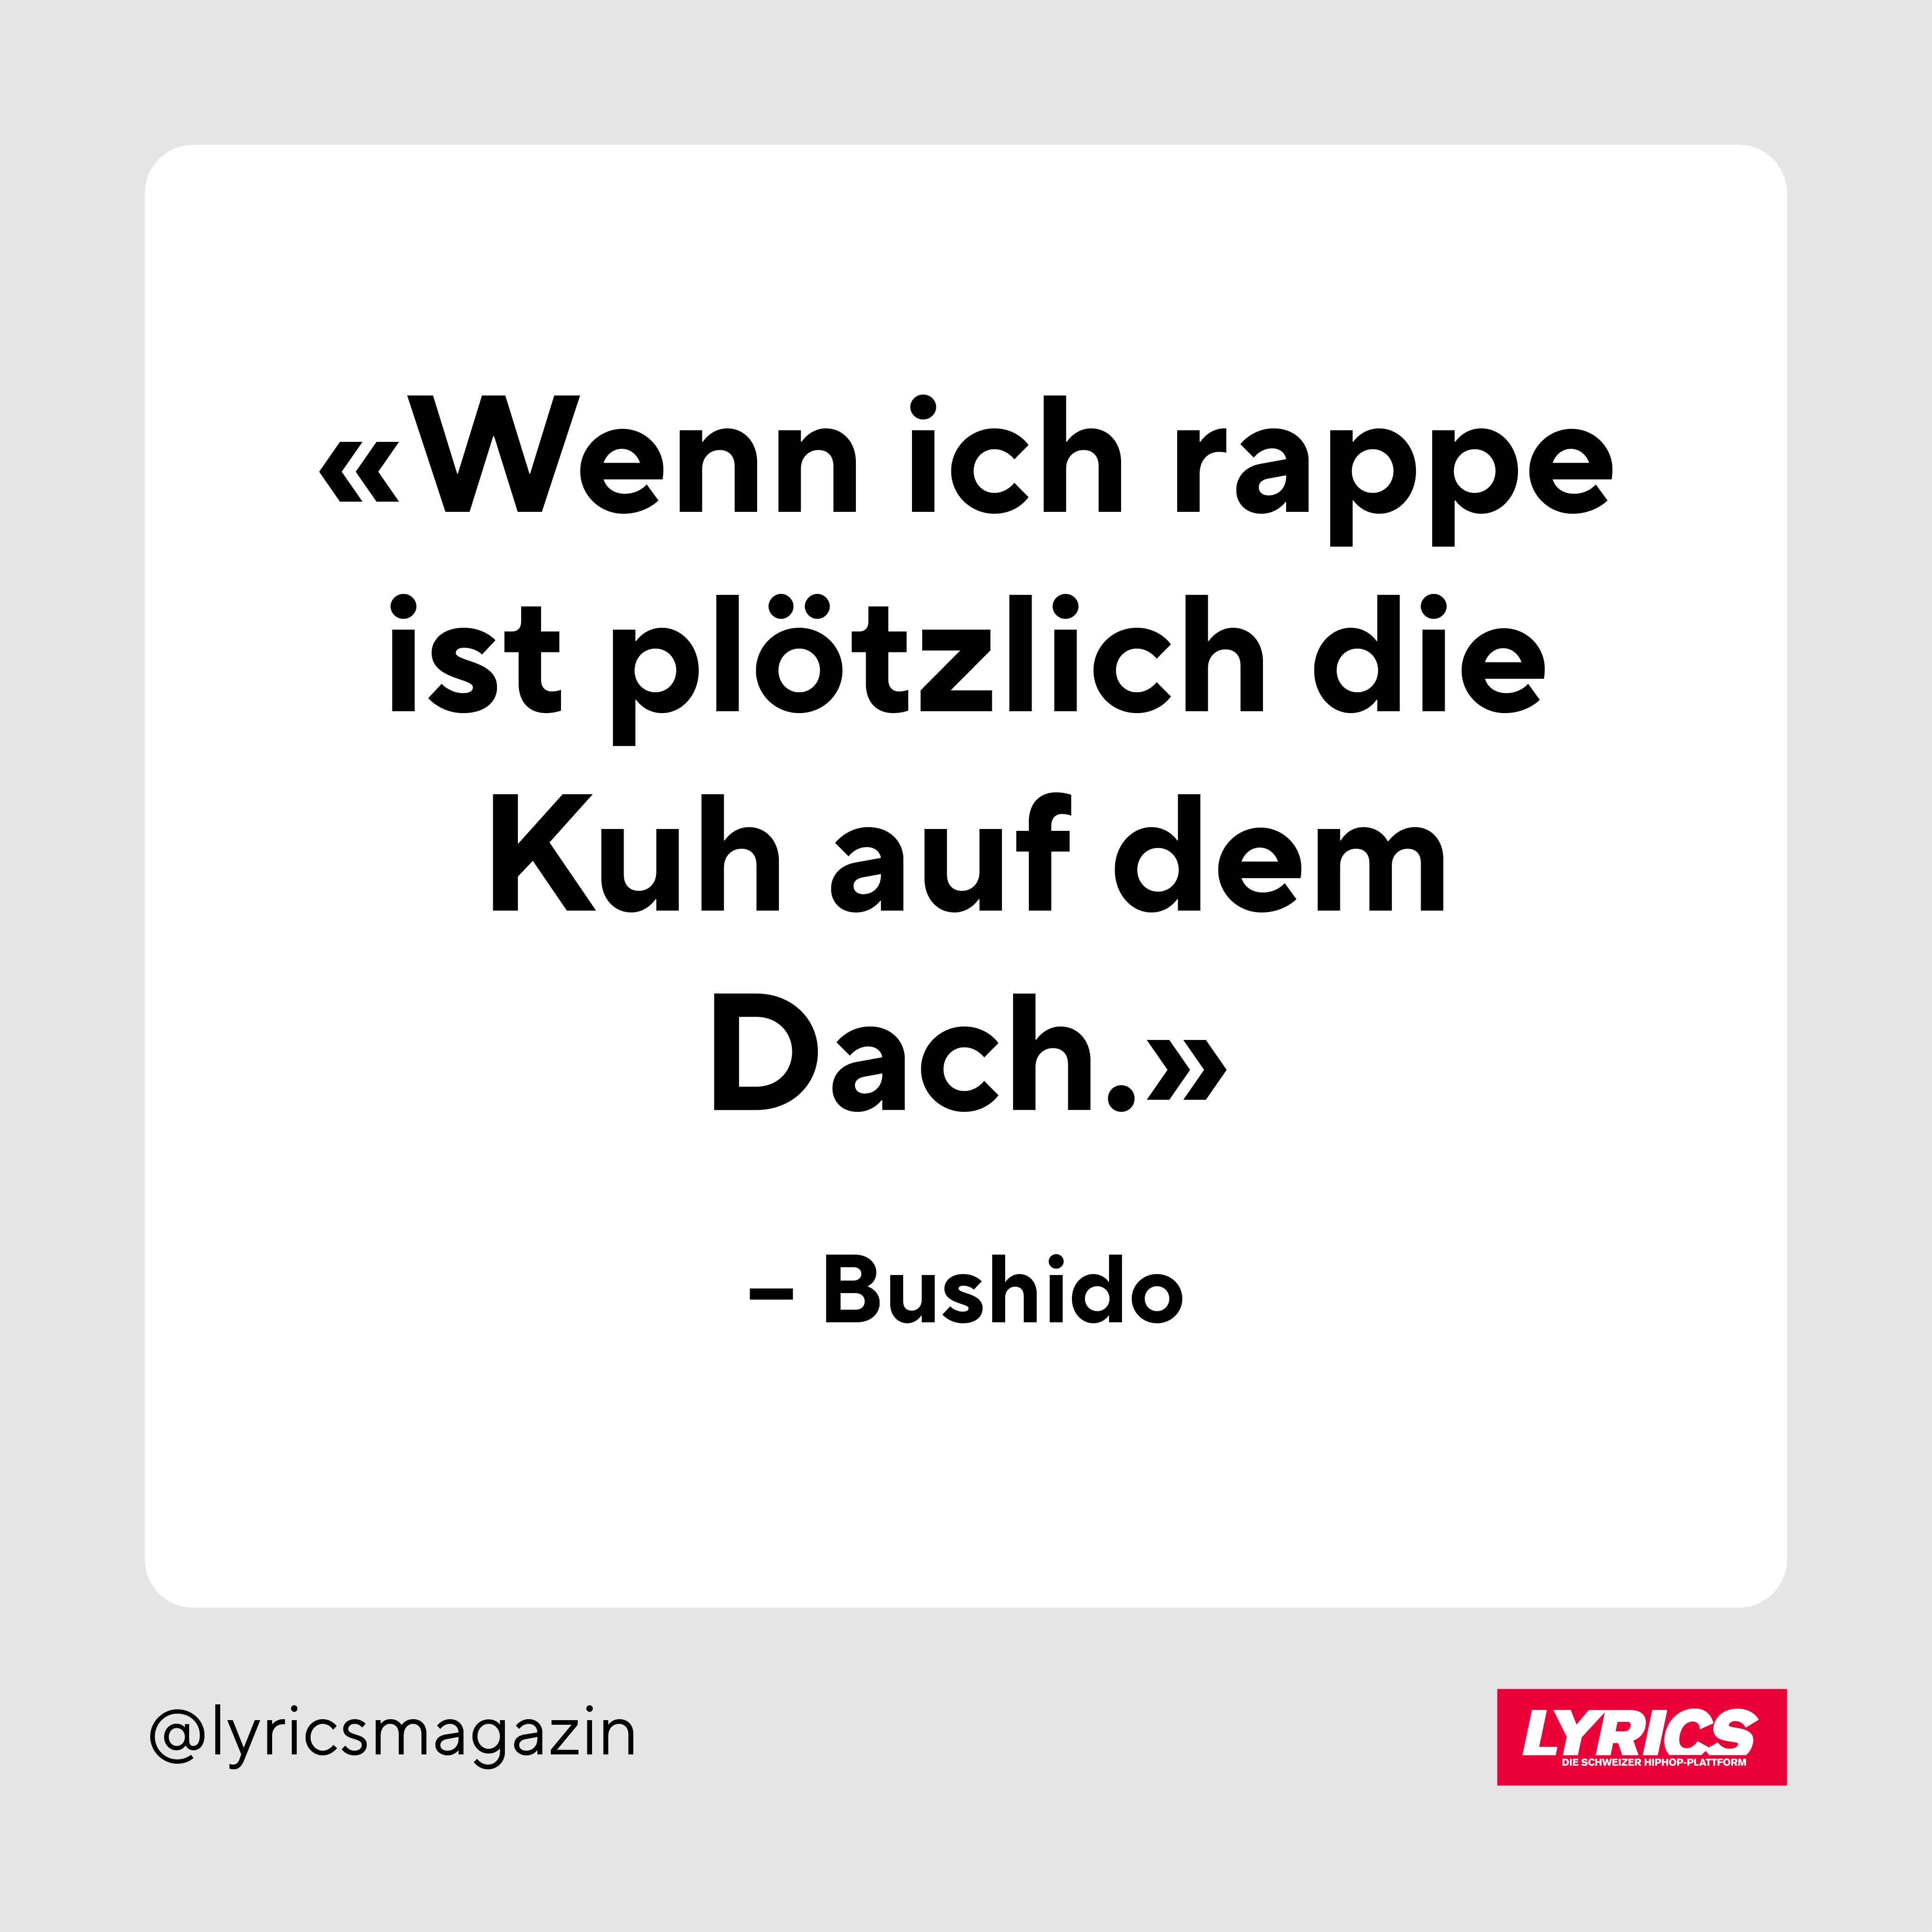 Bushido, Meister der Metaphorik